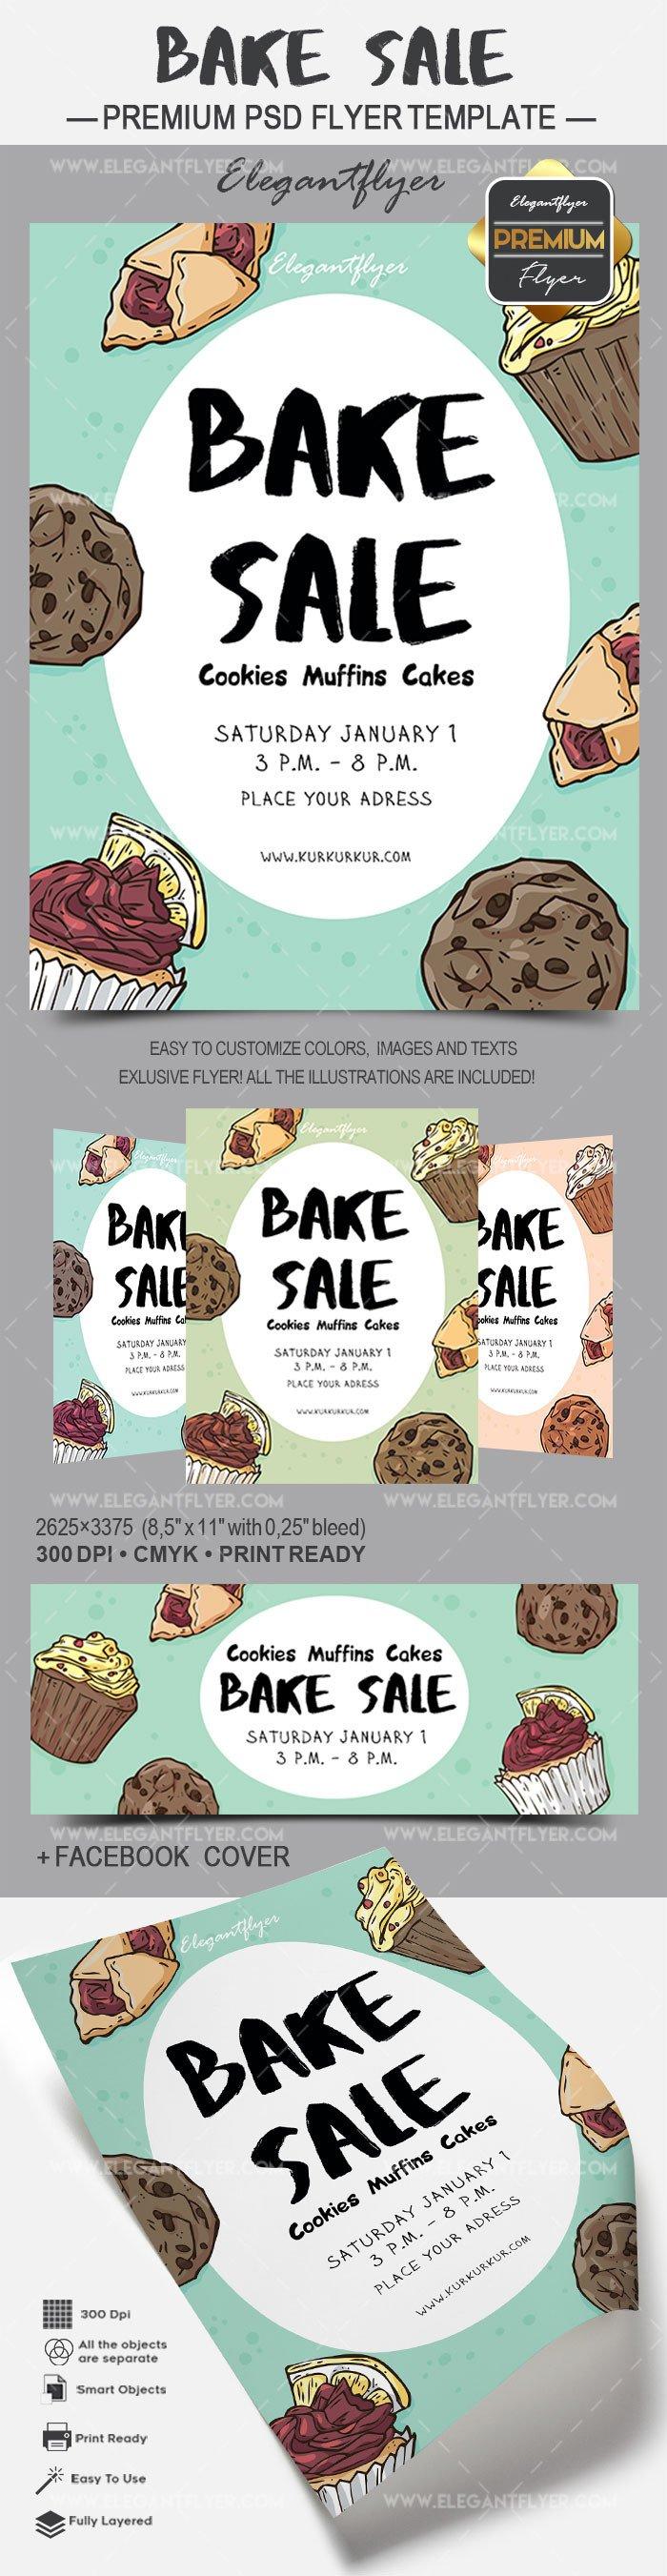 Bake Sale Flyer Template Flyer for Bake Sale Cookies Muffins Cakes – by Elegantflyer